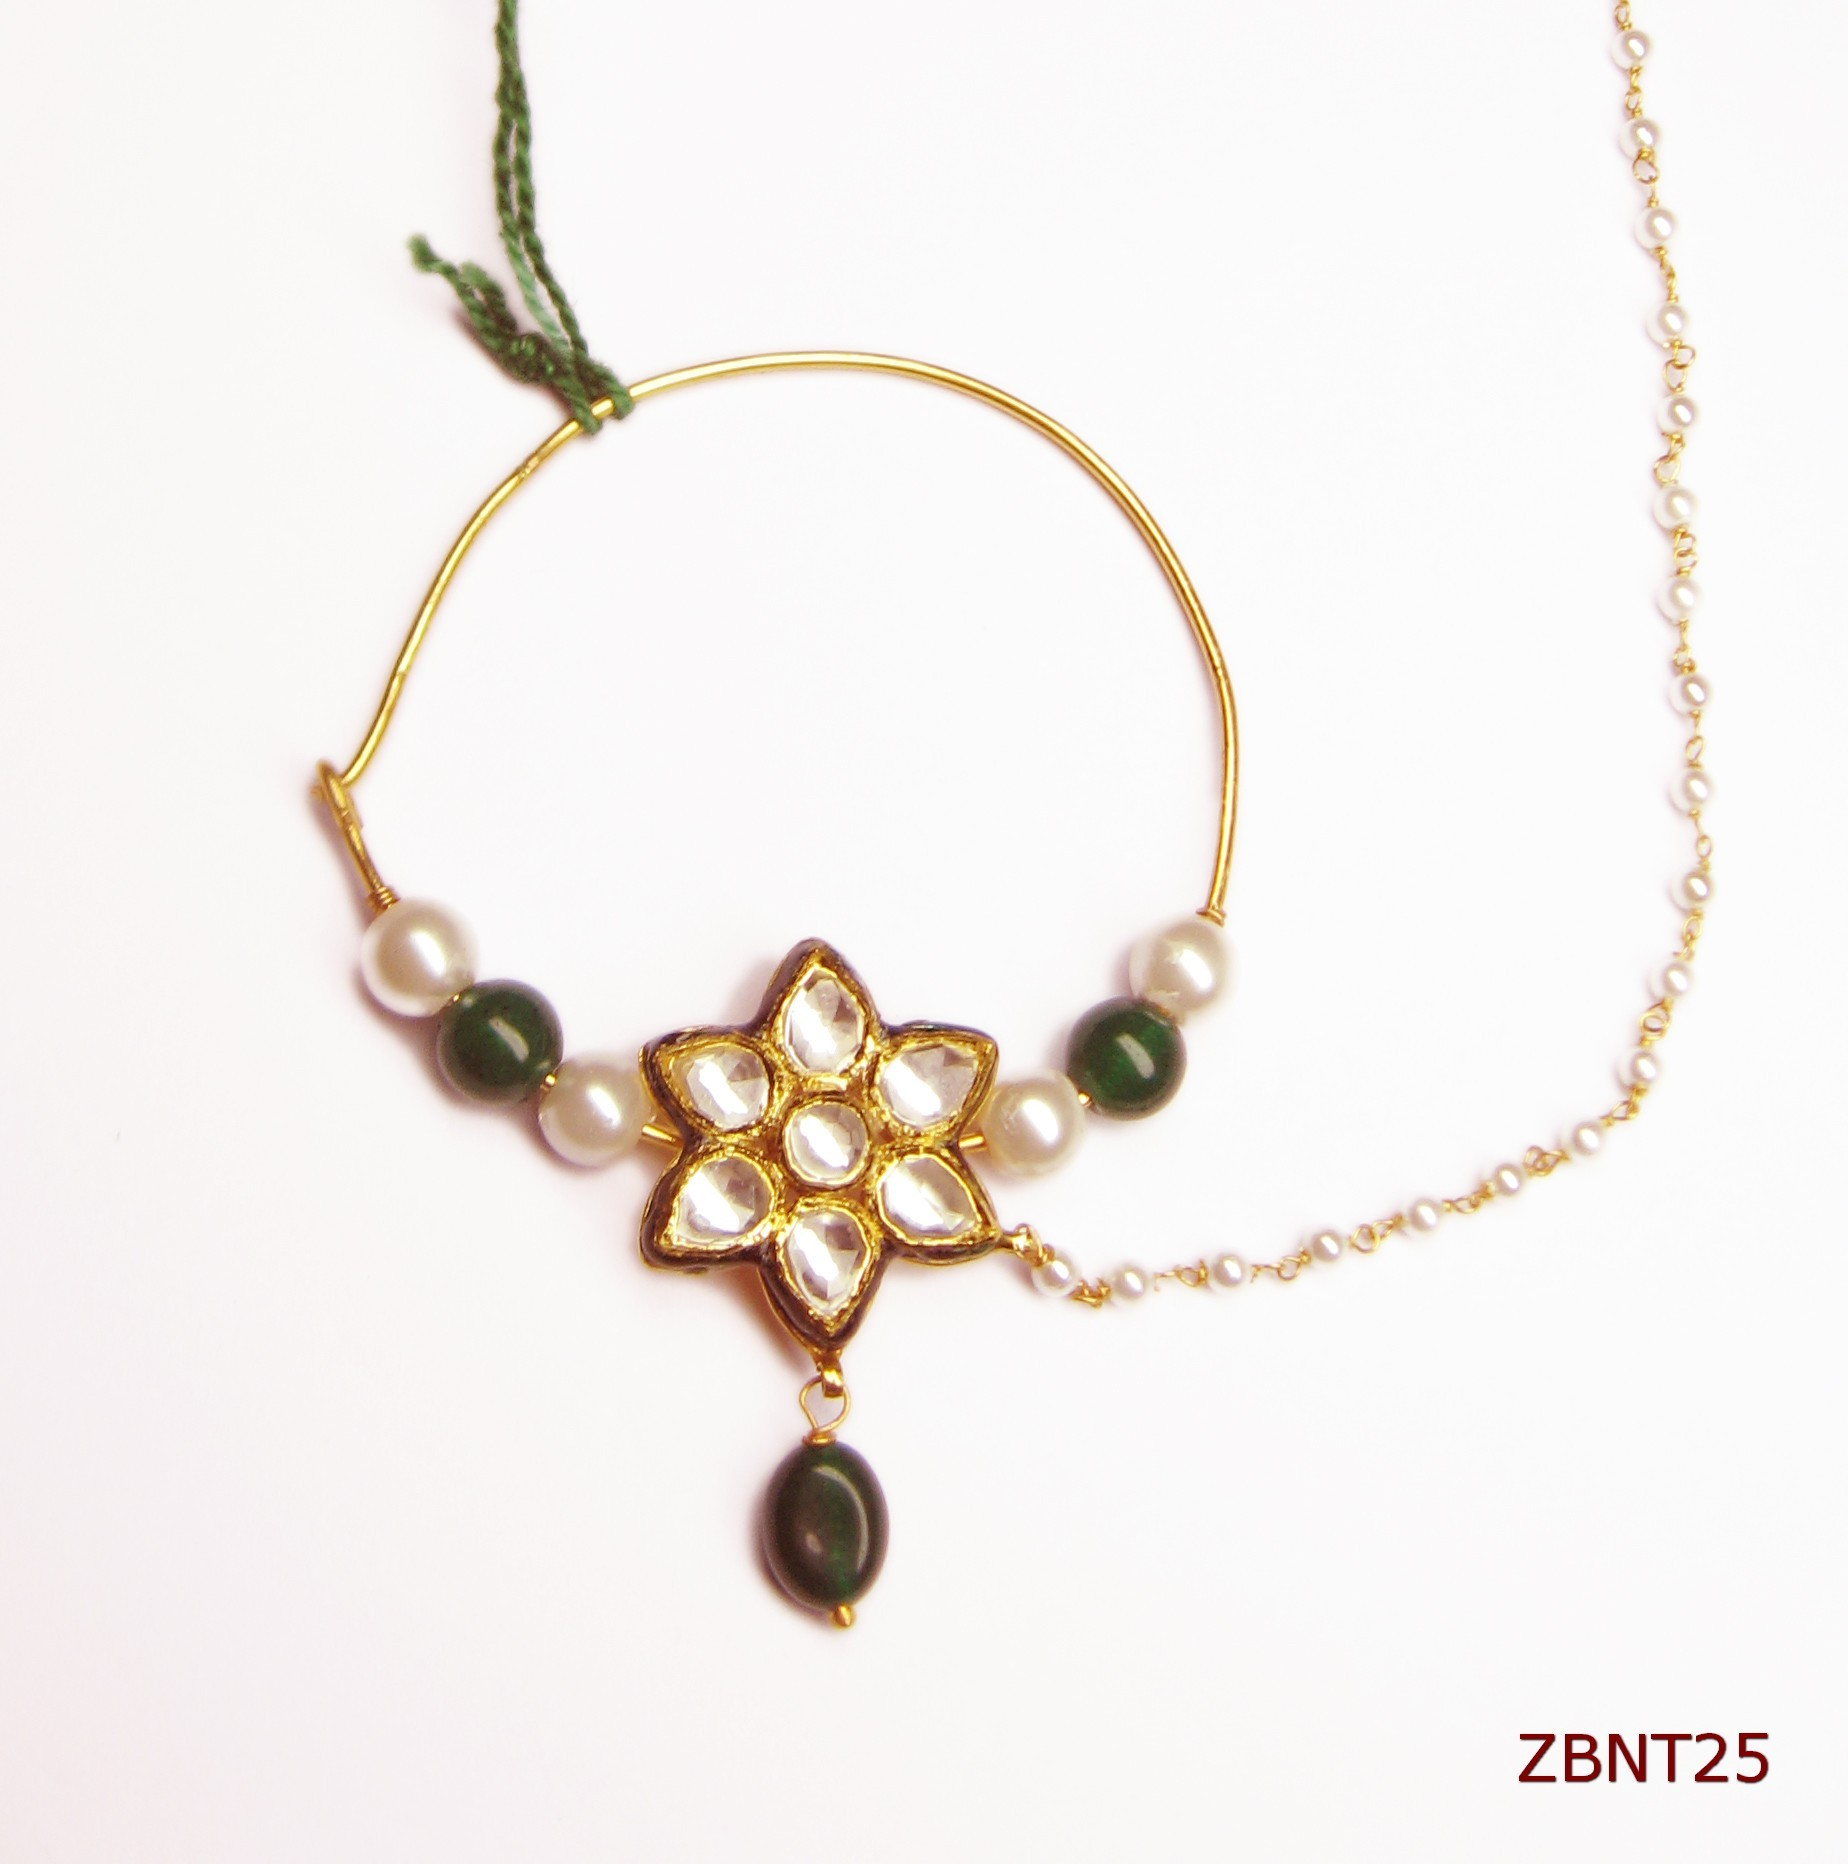 ZBNT25